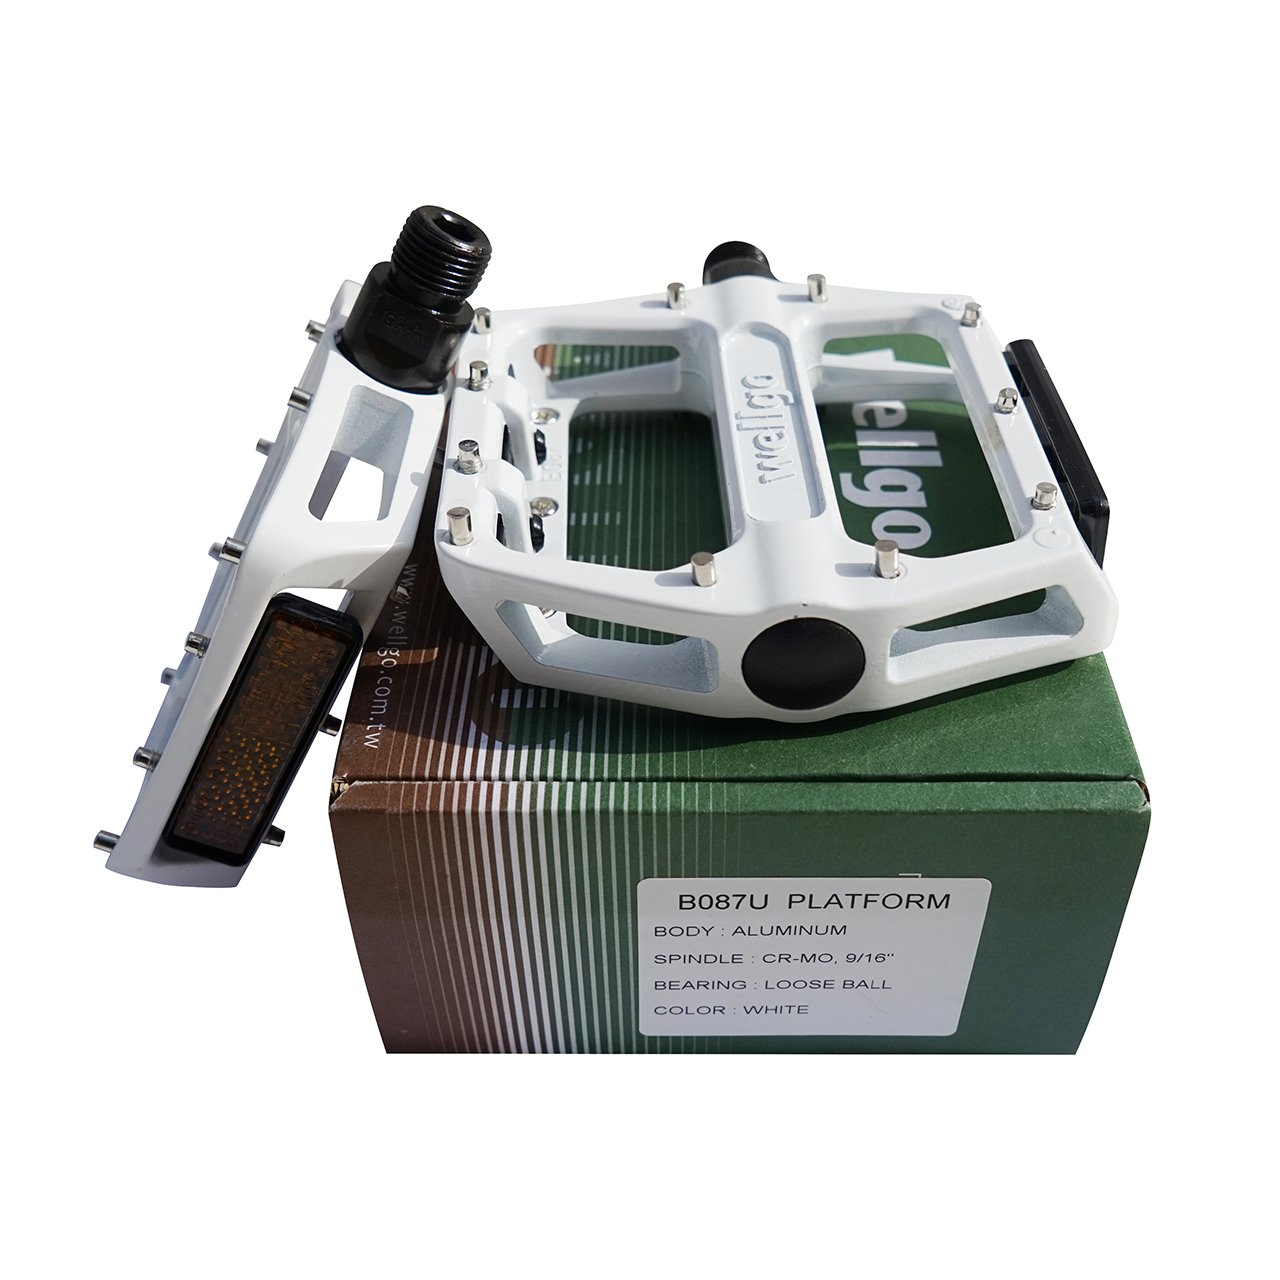 NEW Wellgo b087u Roulement VTT BMX P/édale en aluminium Avec R/éflecteur blanc